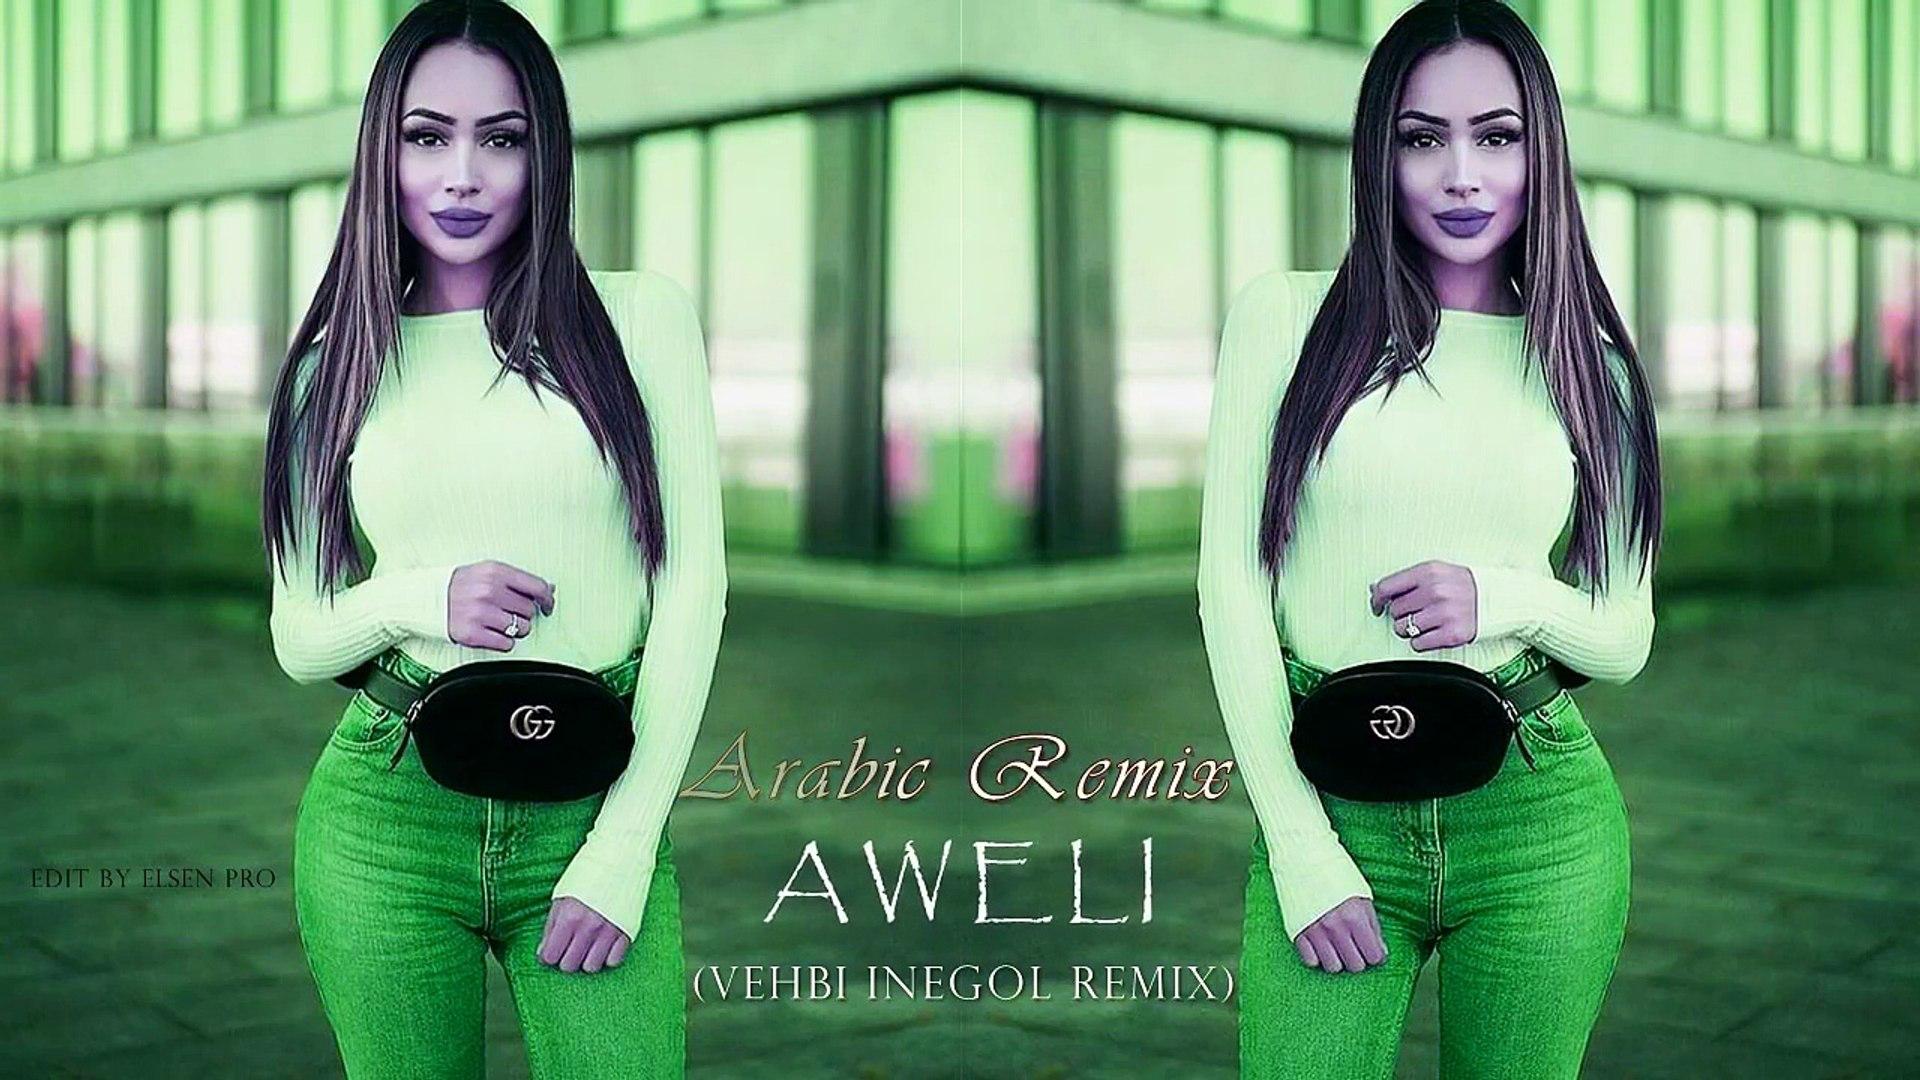 Arabic Remix - AWELI 2018